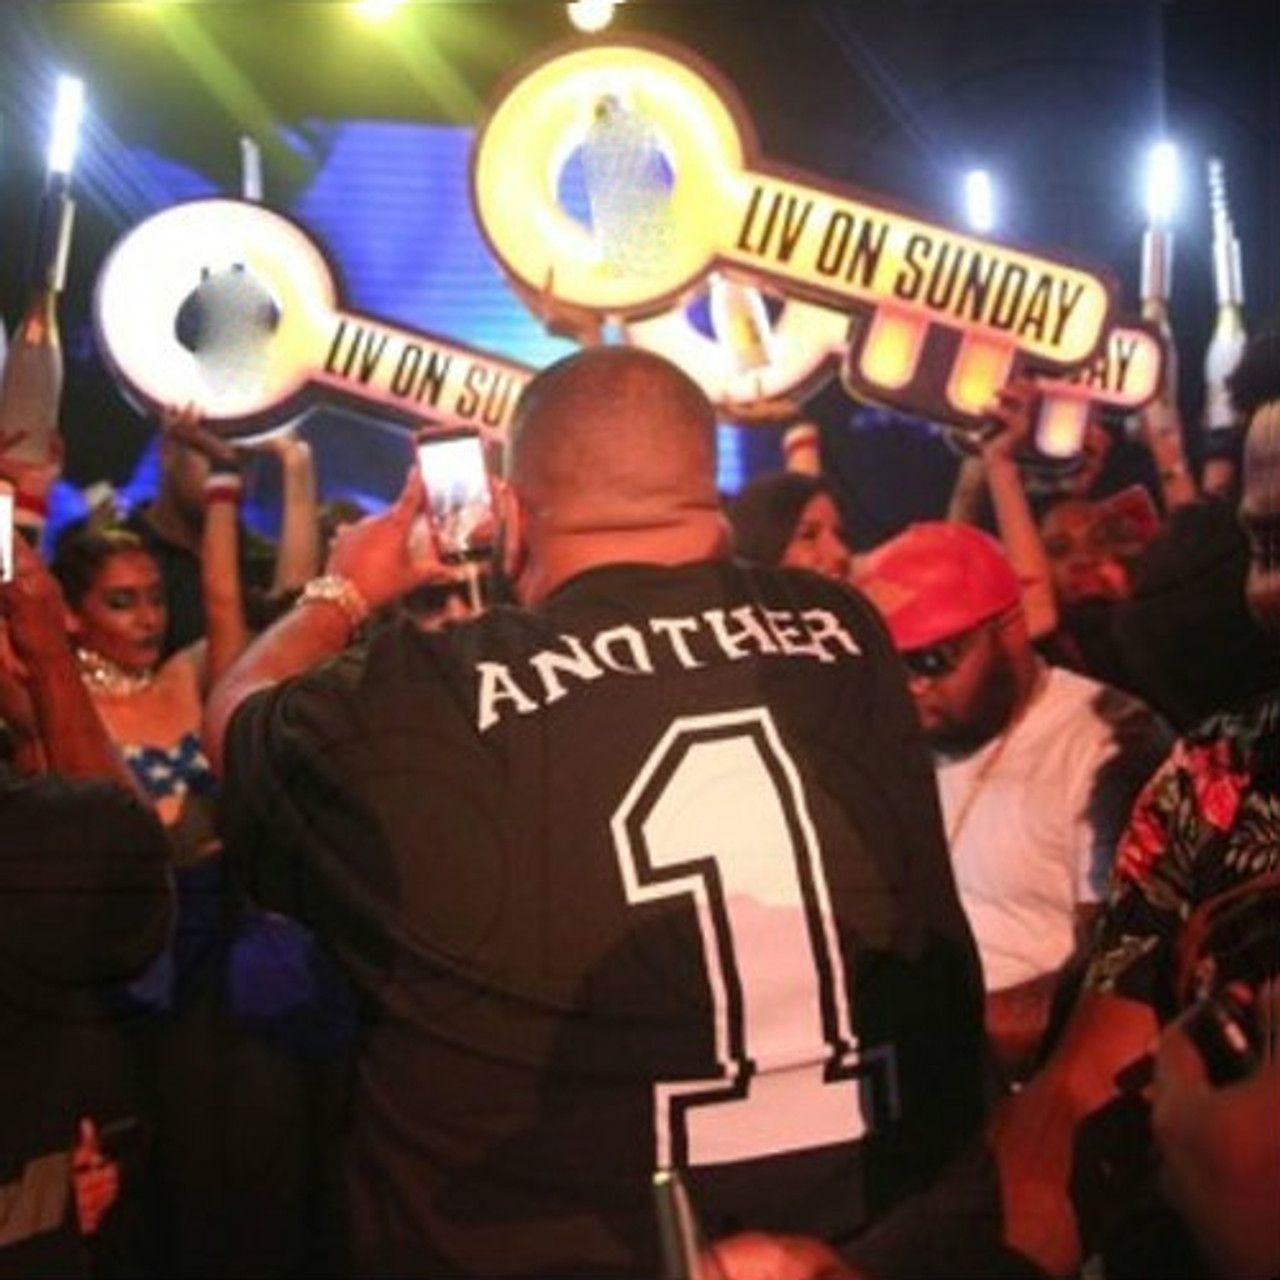 Presenter_bottle_service_Club_key_LIV_Story_Champagne_service_VIP_tray_nightclub_shop